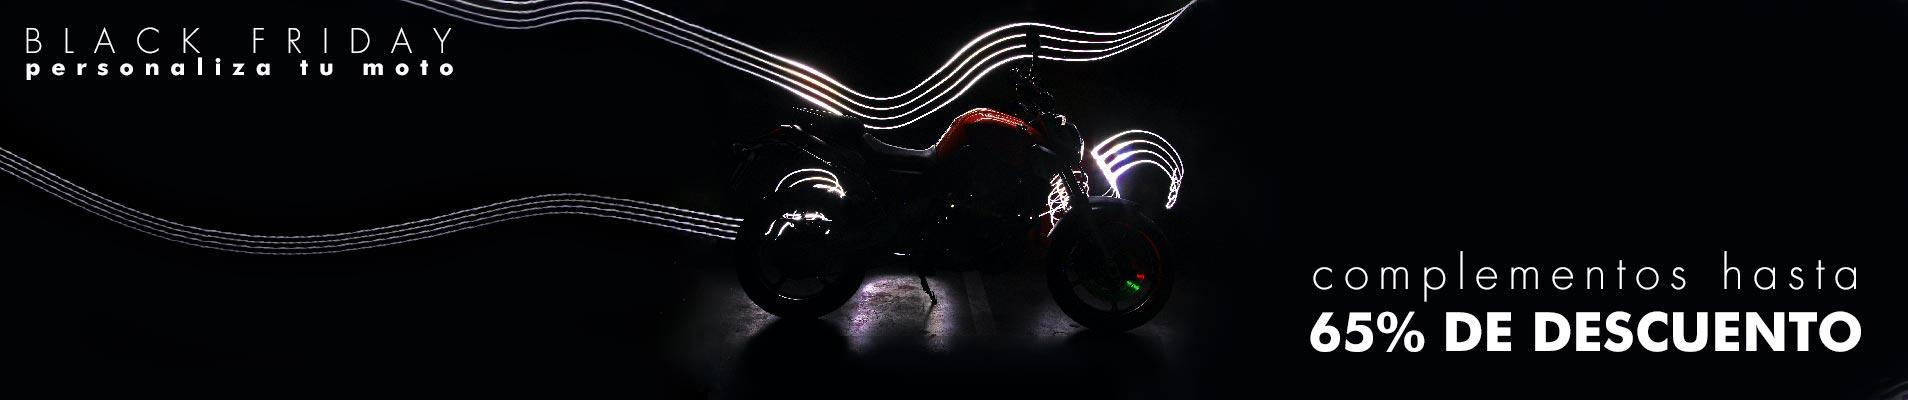 Black friday accesorios para moto